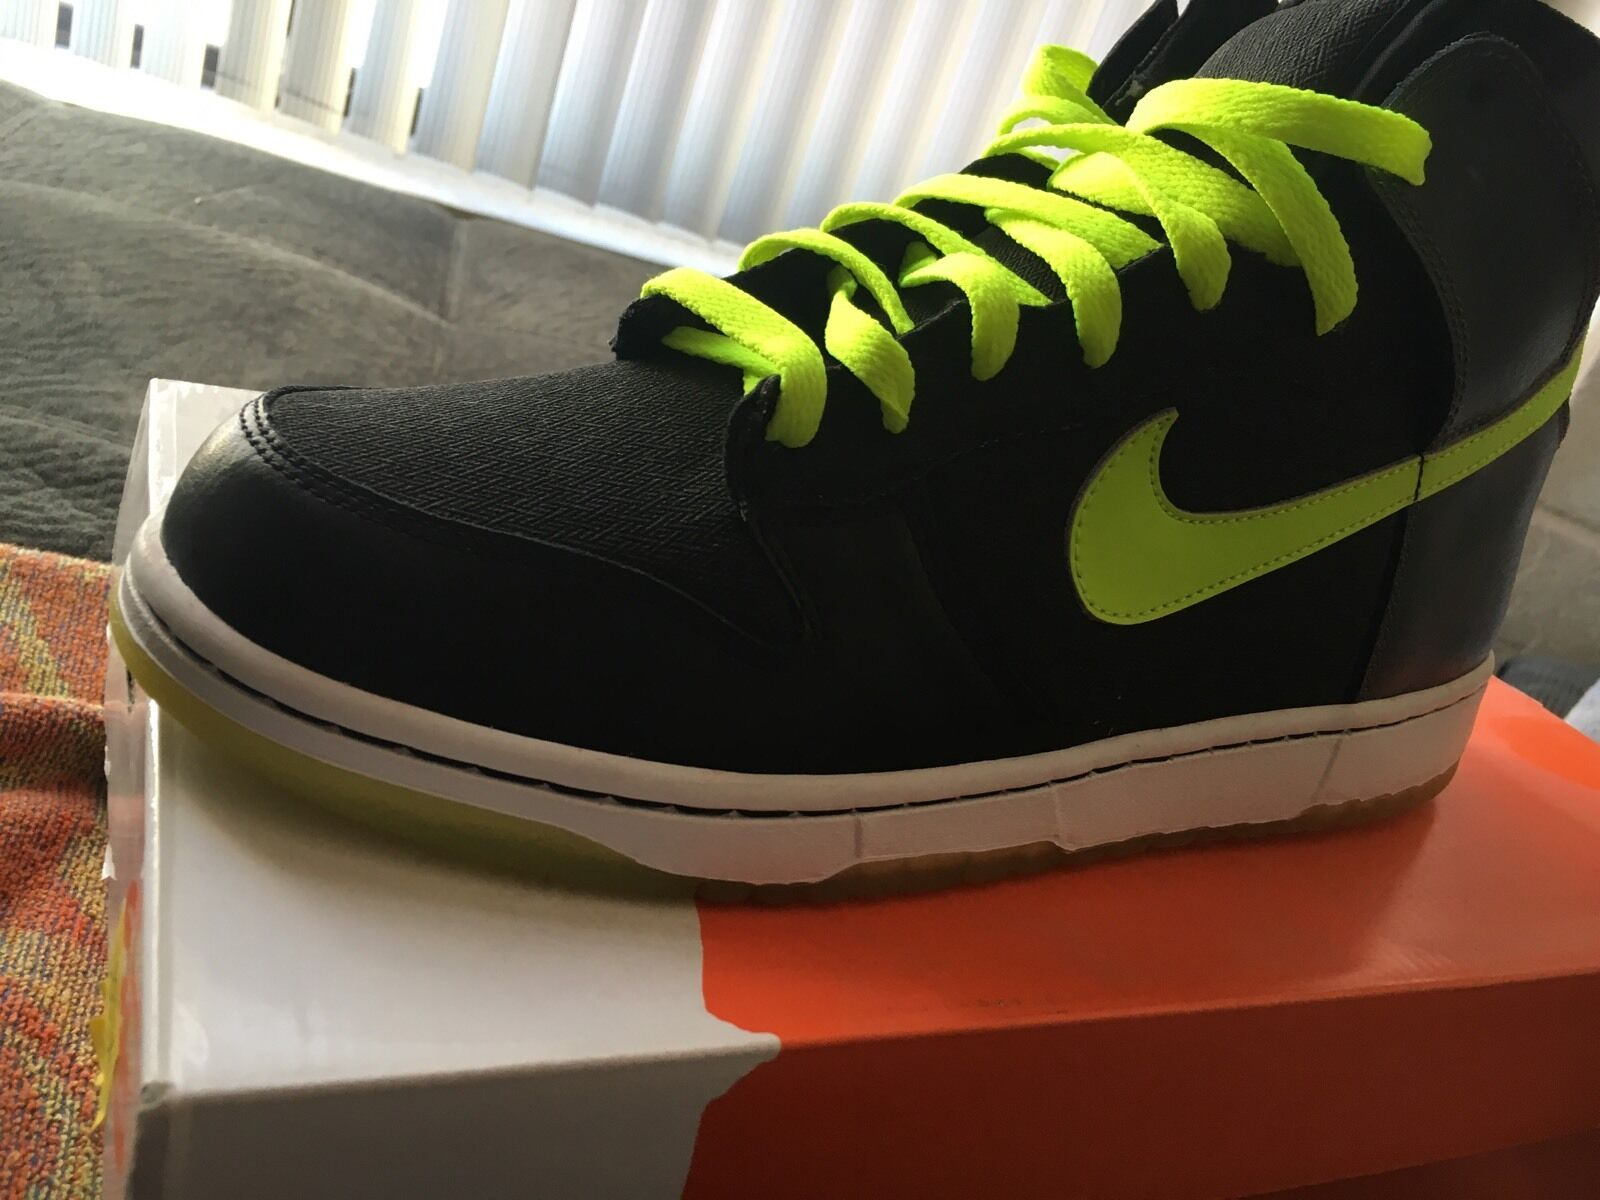 Nike Dunk High 6.0 PRM (2007)